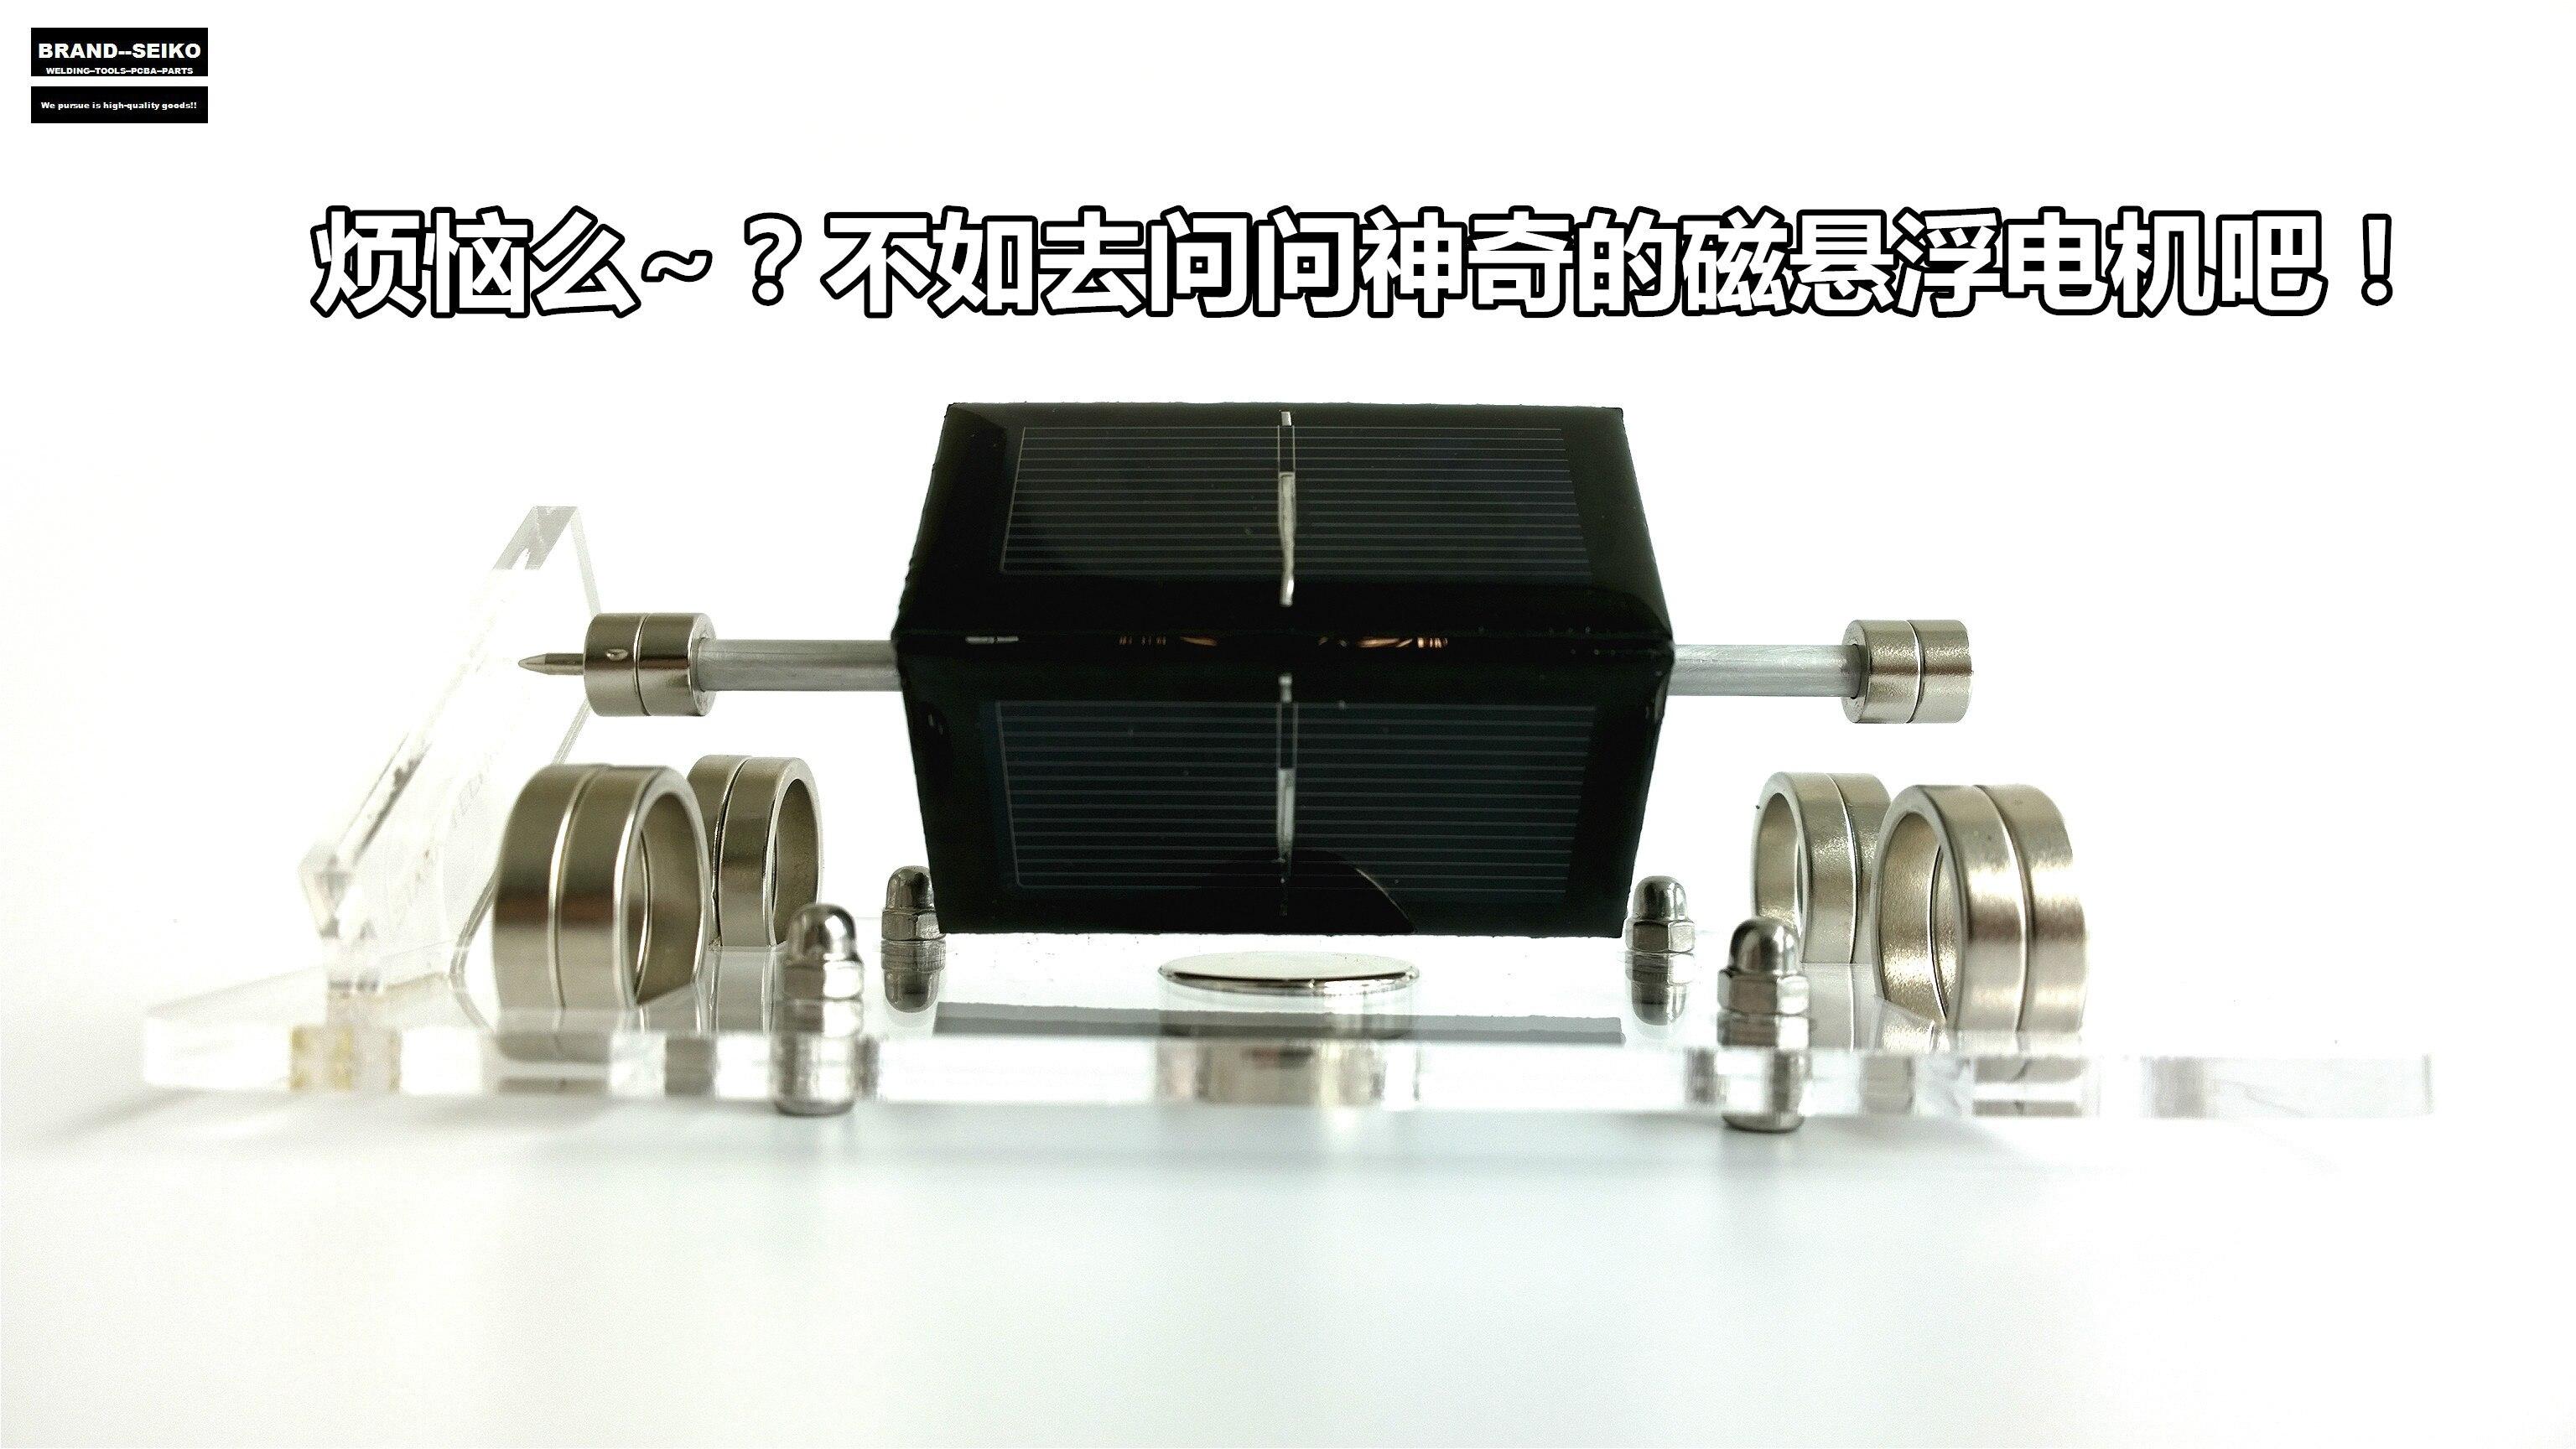 solar magnetic levitation motor creative maglev furnishing articles science carbon brush dc motor/implant motor/rotating motor<br><br>Aliexpress